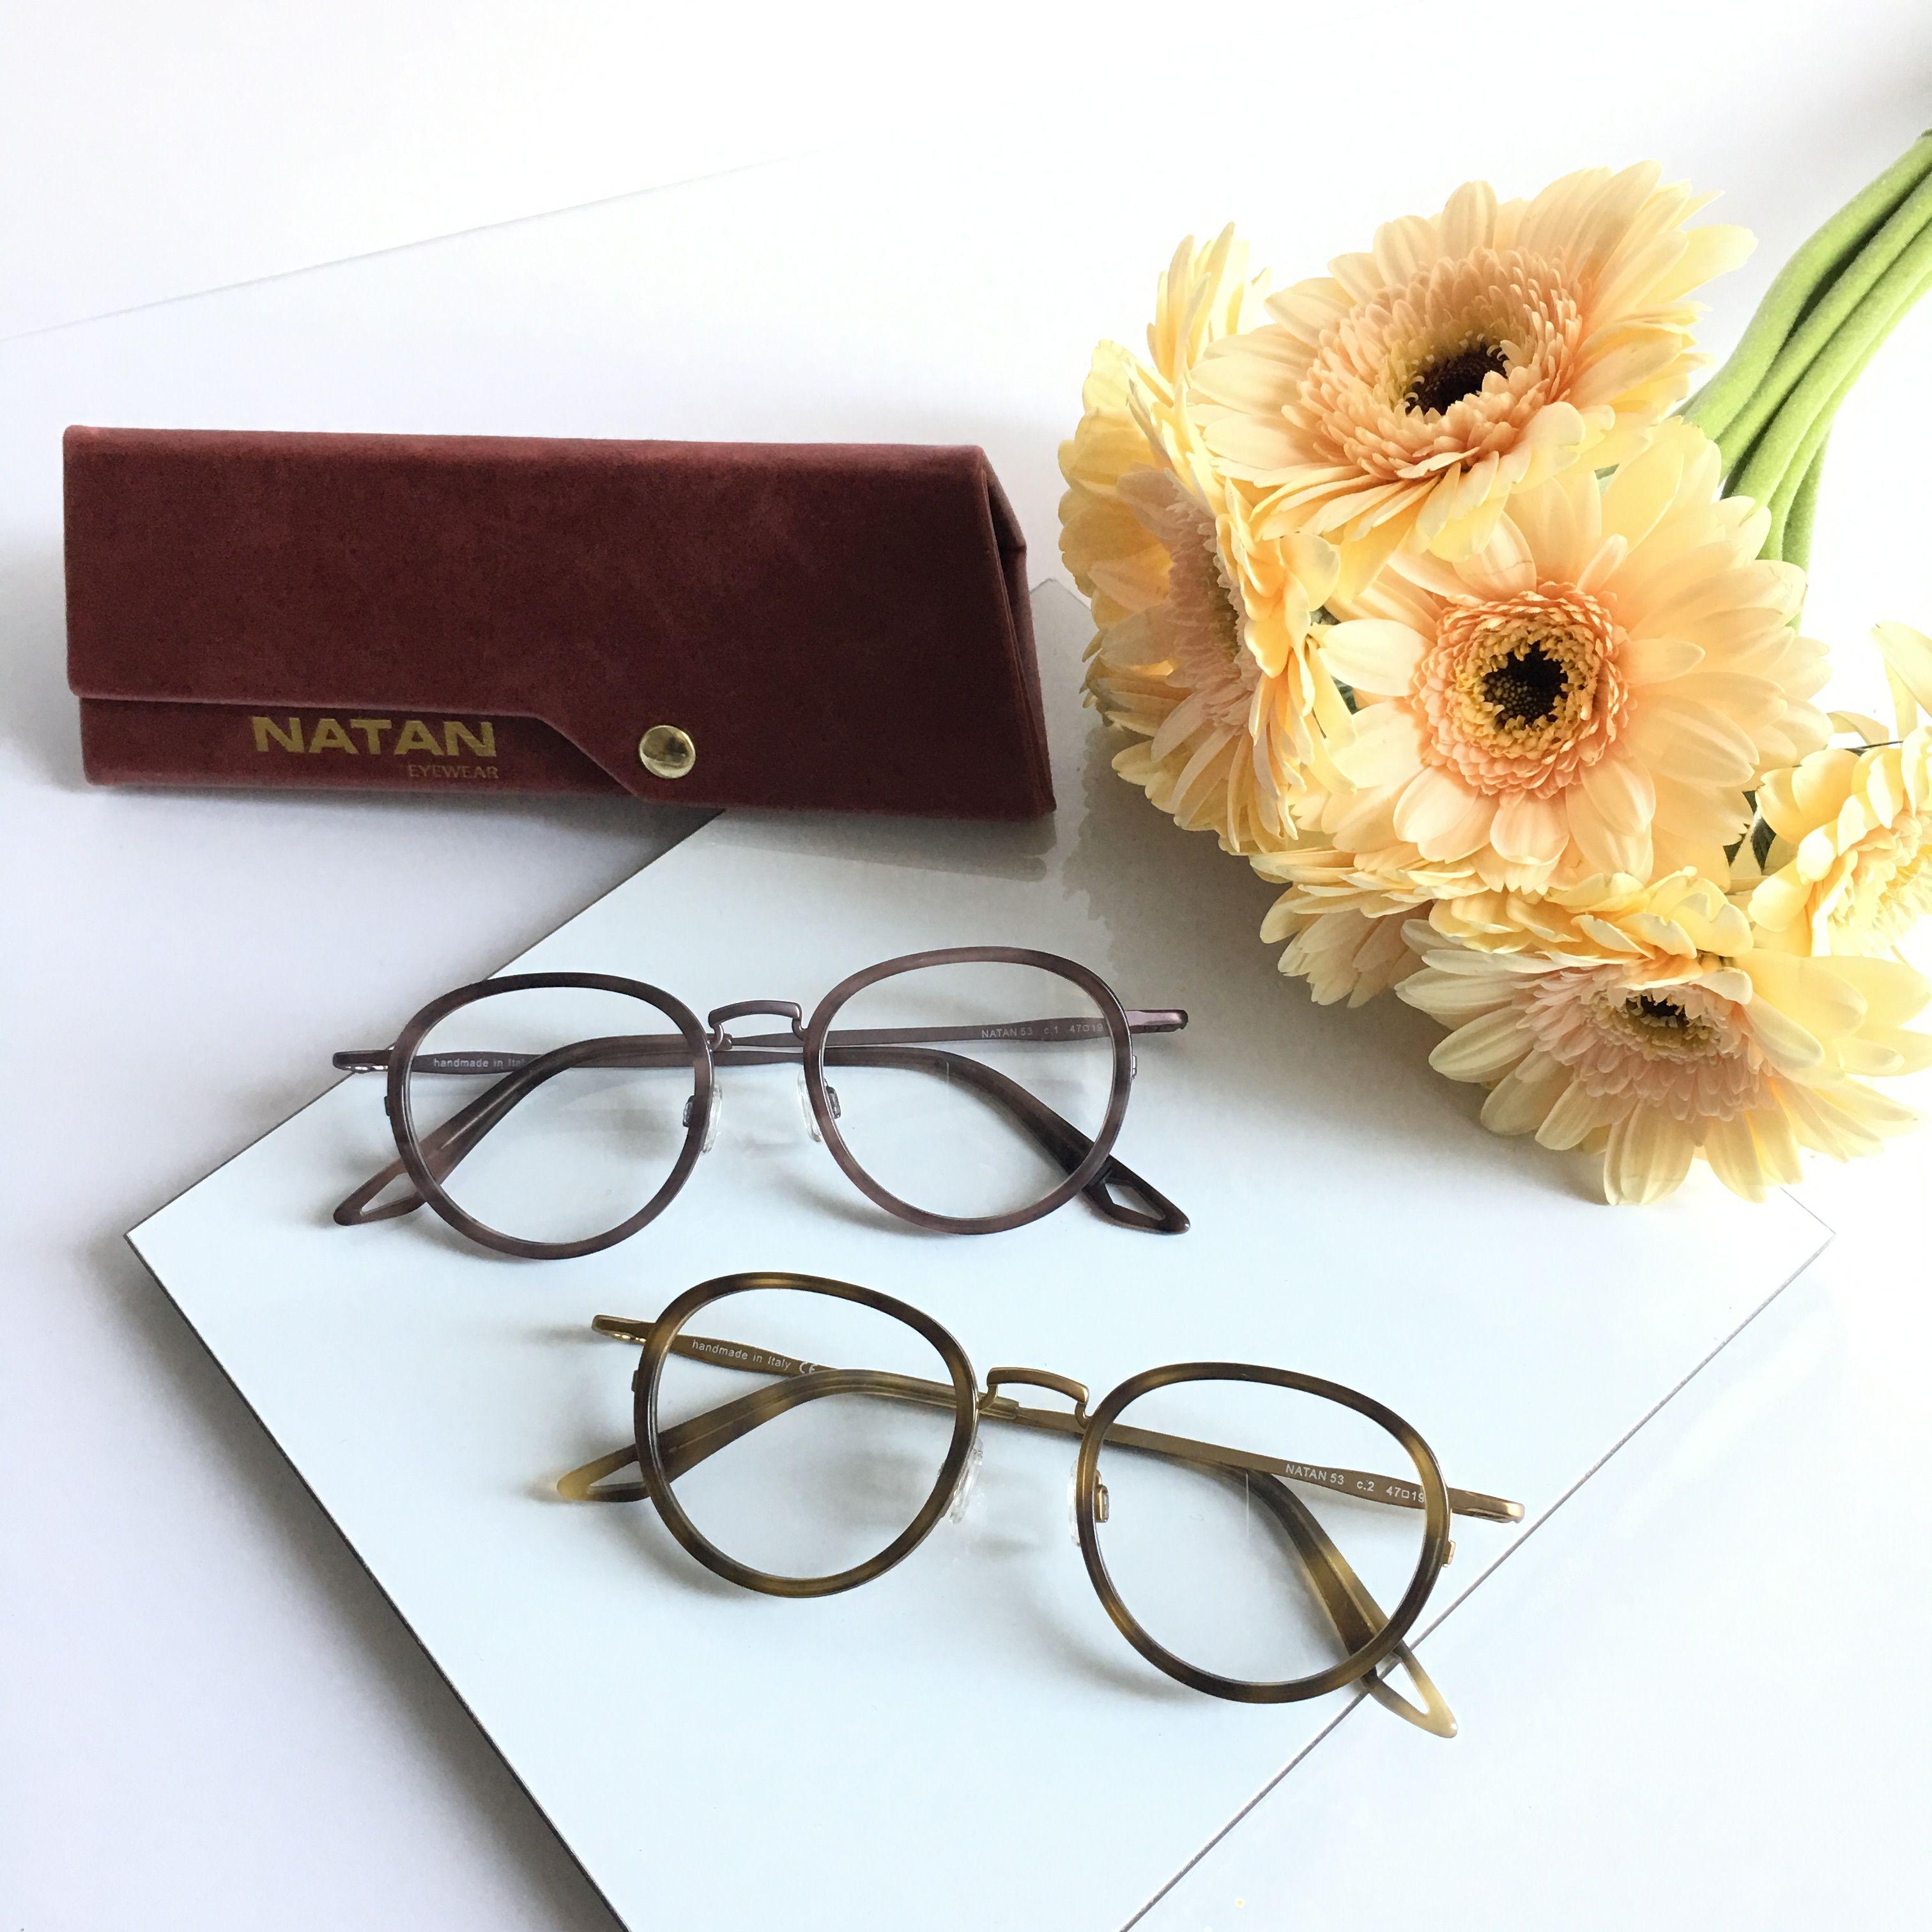 all ad jaguar eyewear glasses levit barnard rgb lindberg brands prescription resized